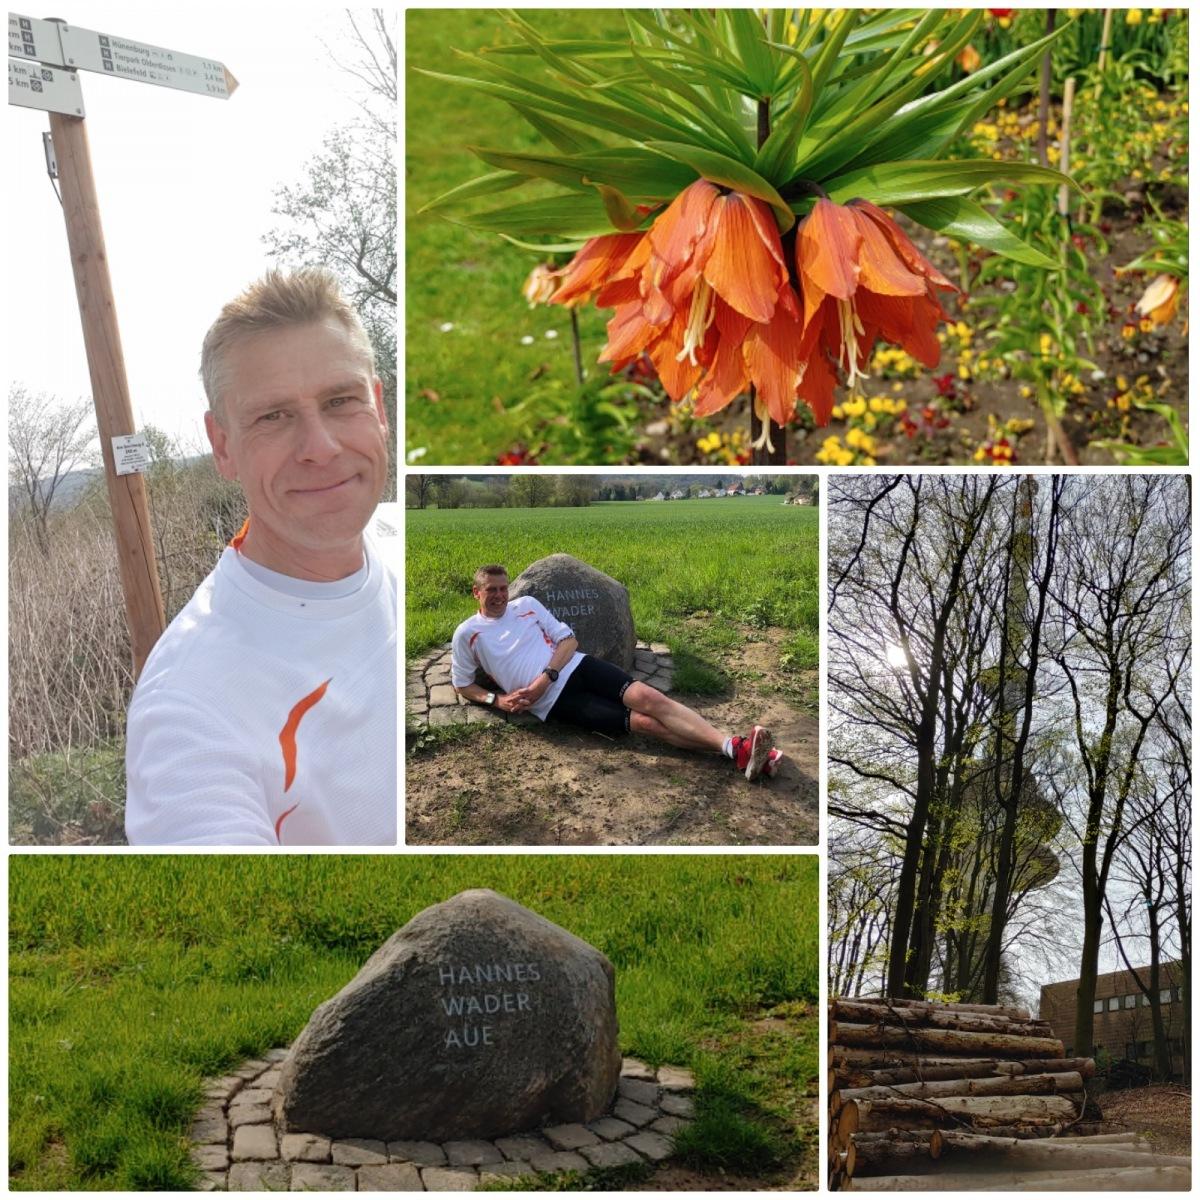 Beimdiek-Klaus-Peter-17-Challenge-Nature-Run-s8huZ